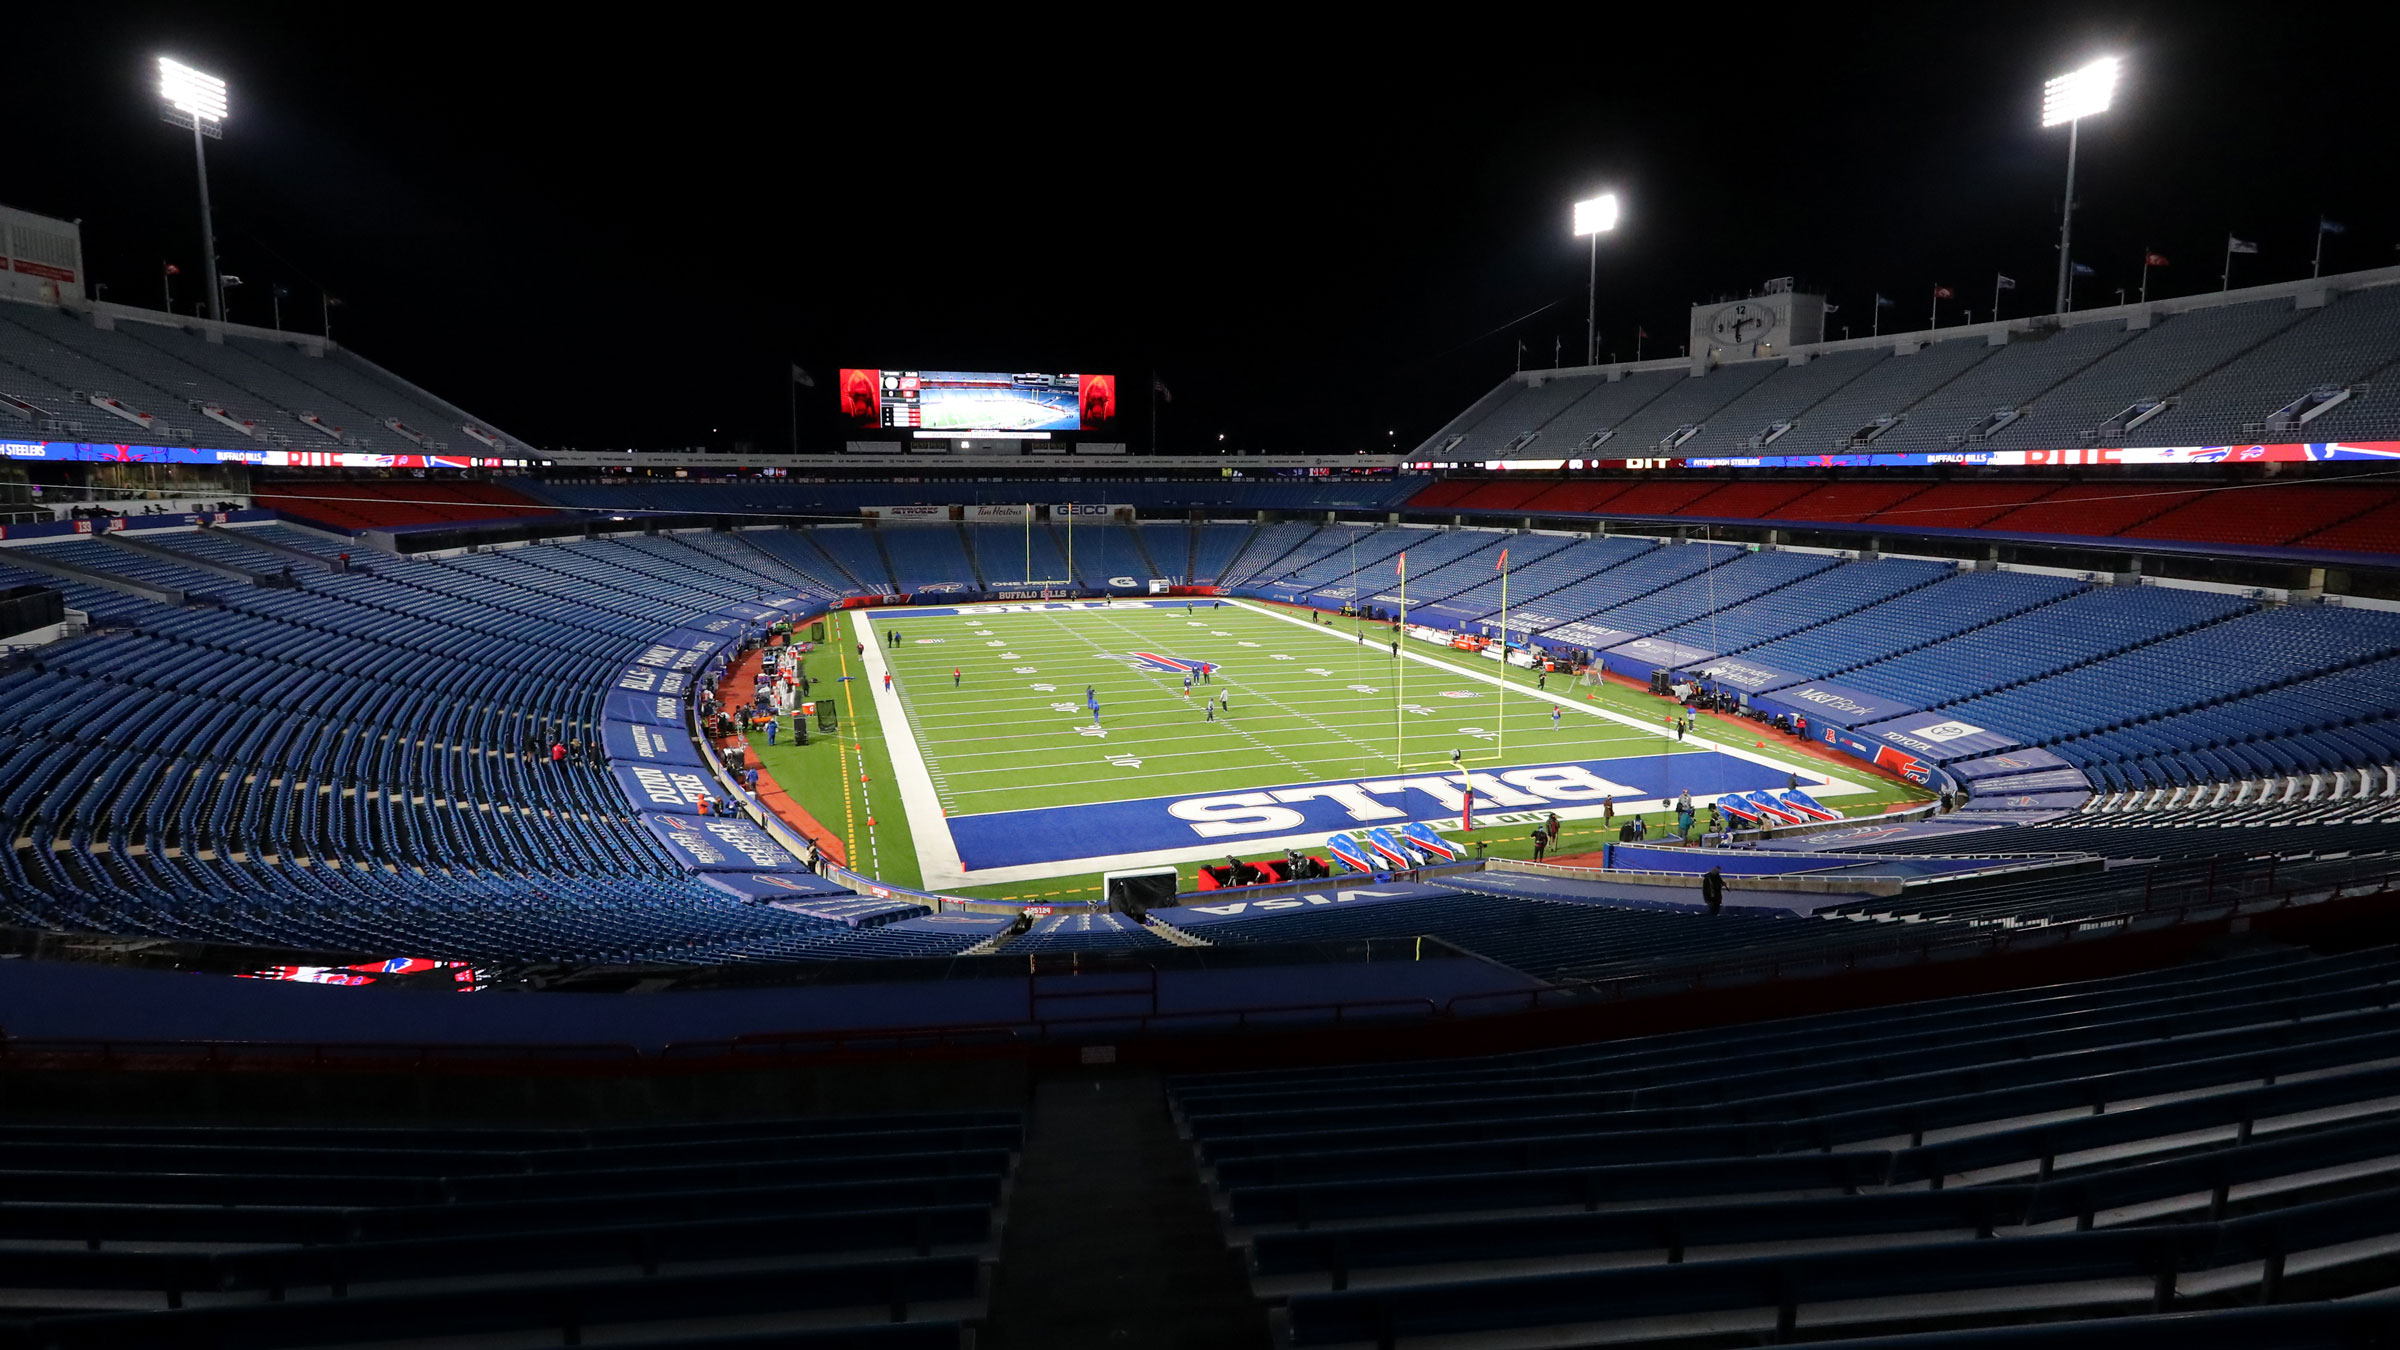 Bills Stadium is seen before a game on December 13.